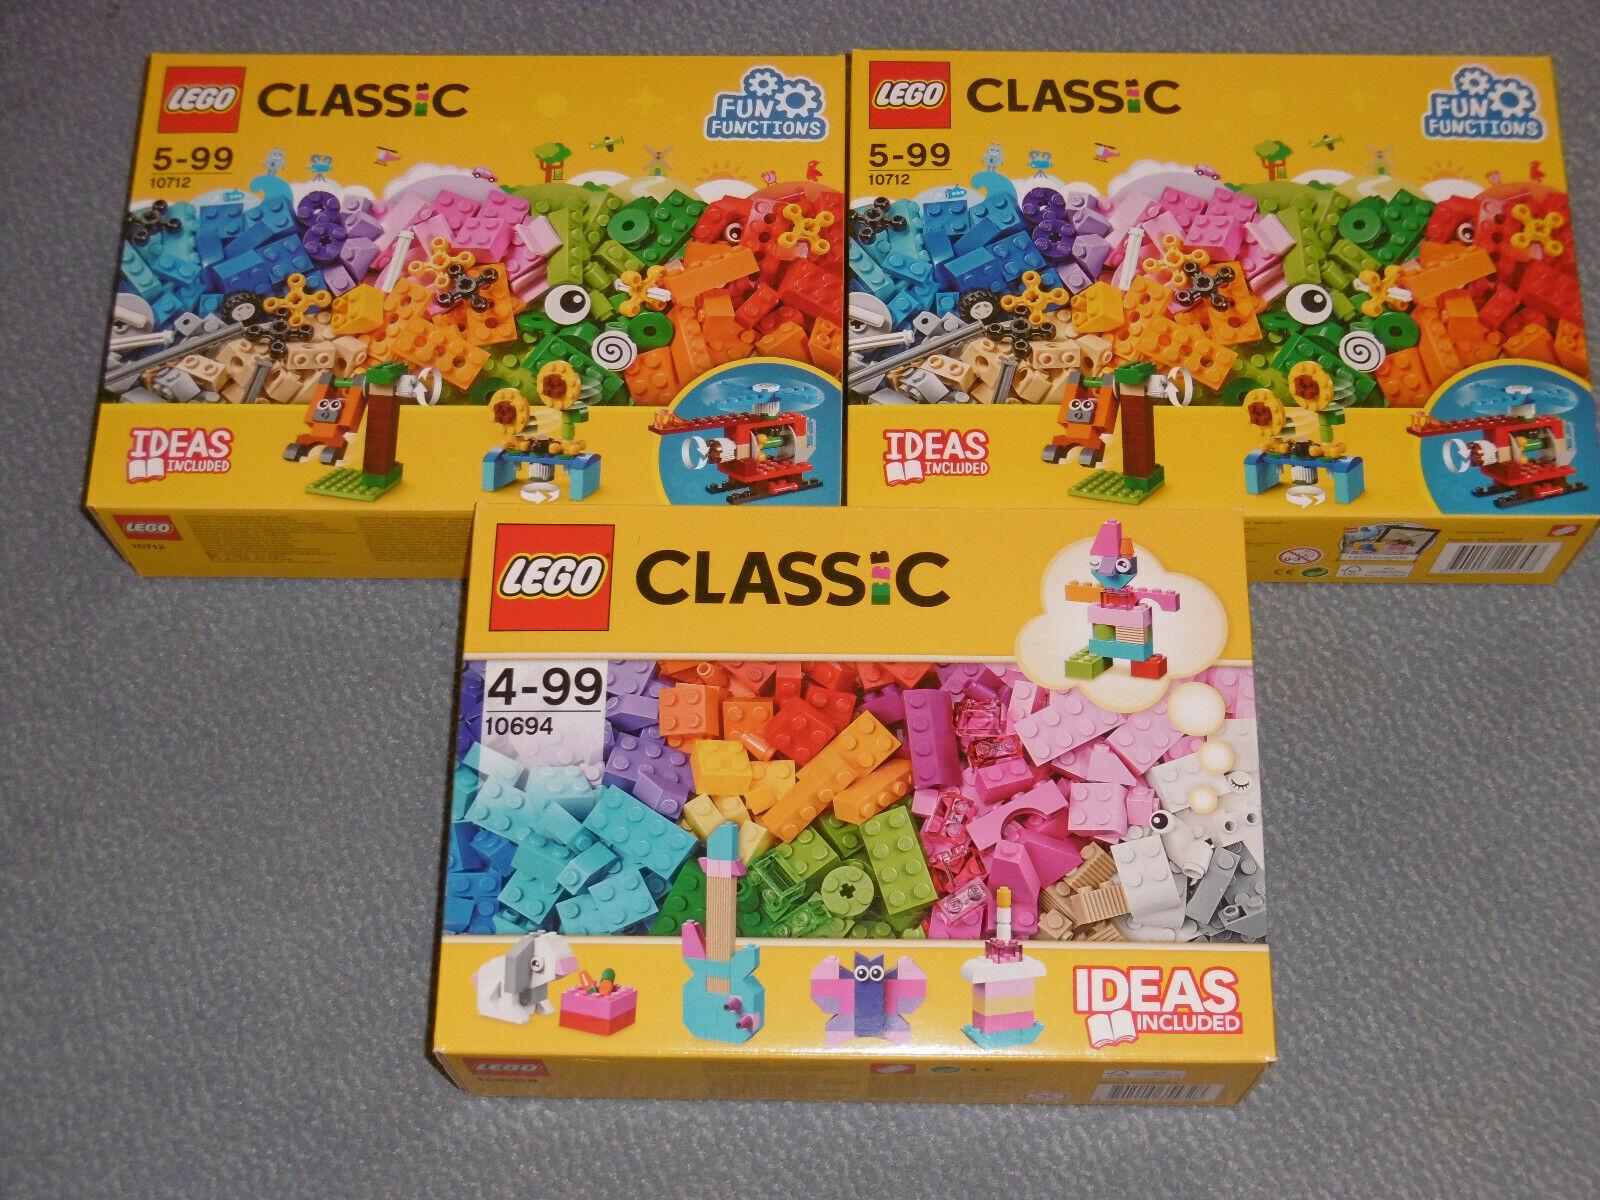 2 x Lego Classic 10712  und 1 x Lego Classic 10694